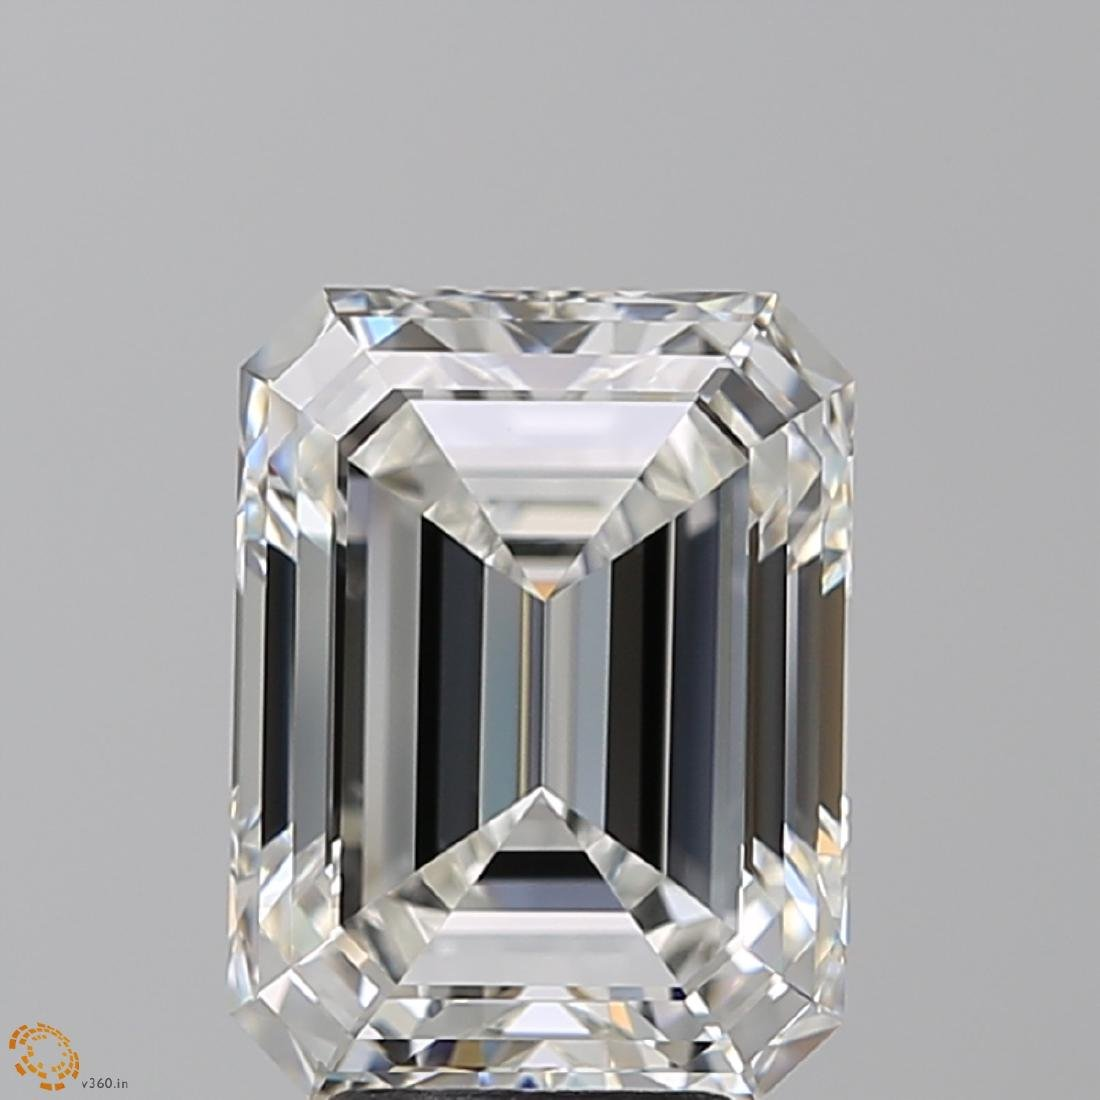 5.01 ct, Color G/VVS1, Emerald cut Diamond - 2